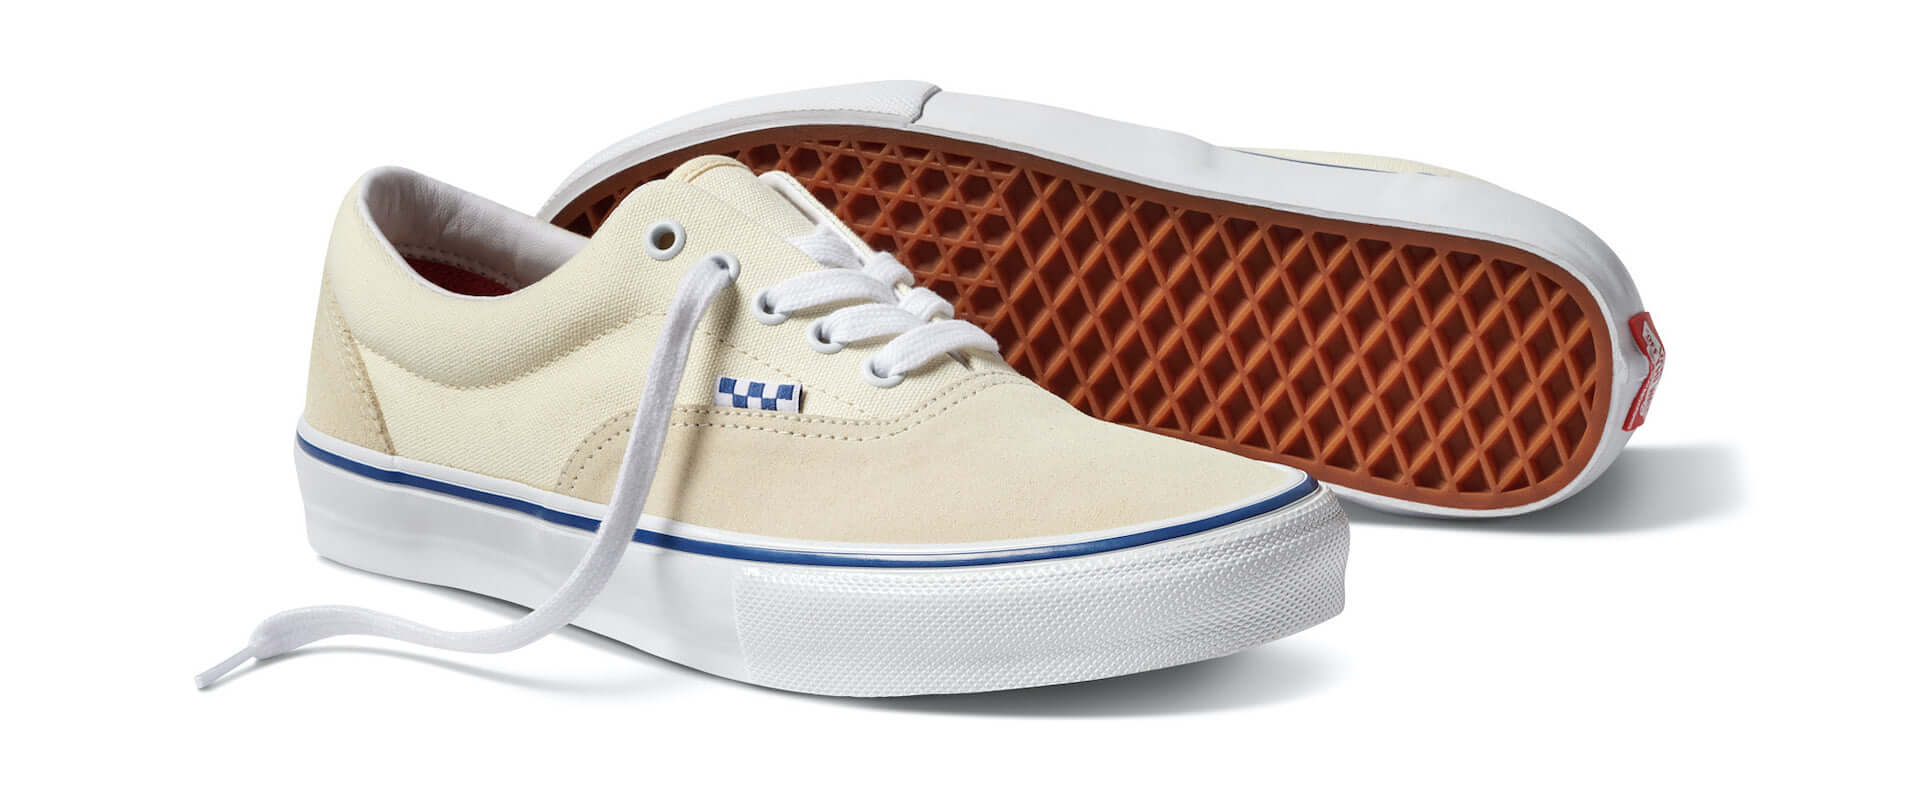 "VANSがスケーターに向けた新コレクション「Skate Classics」を発表!""全てが新しくなった""素材・構造に注目 lf210304_vans_15-1920x790"